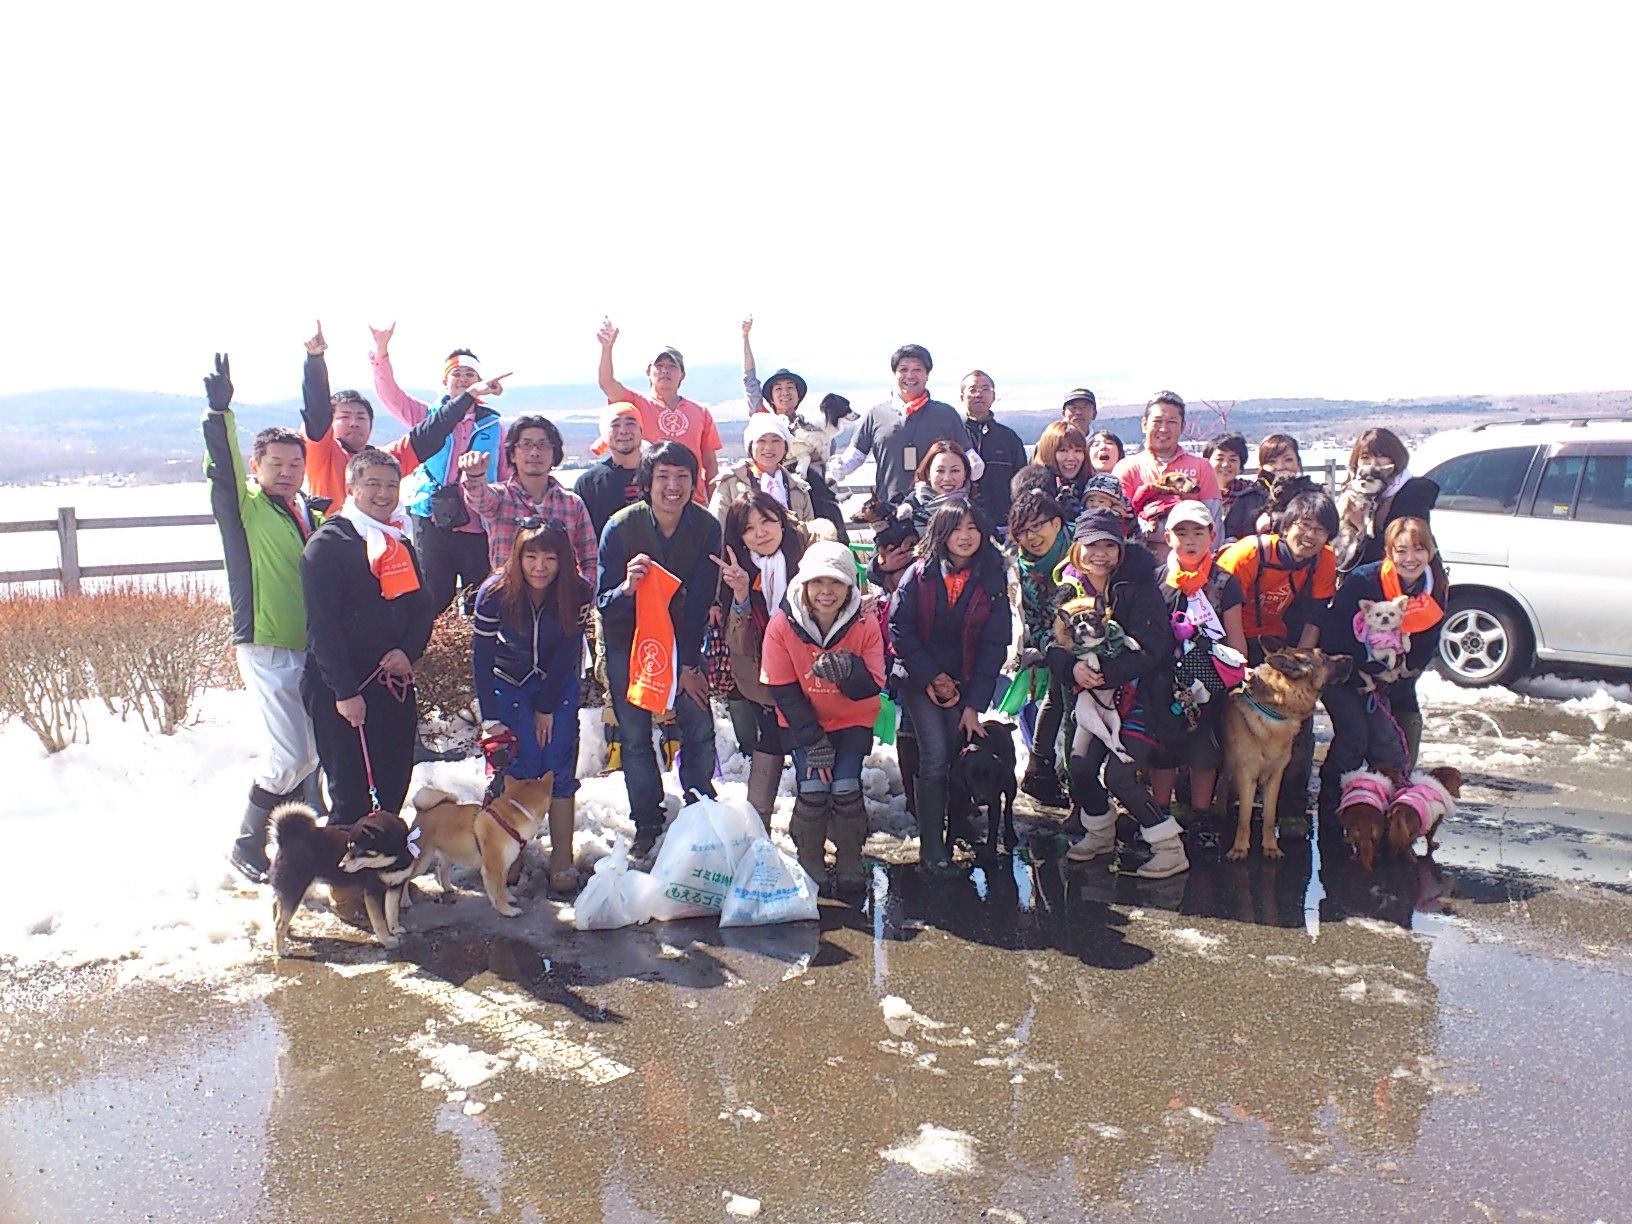 http://gentleone.jp/teams/yamanakako/DSC_0767.JPG